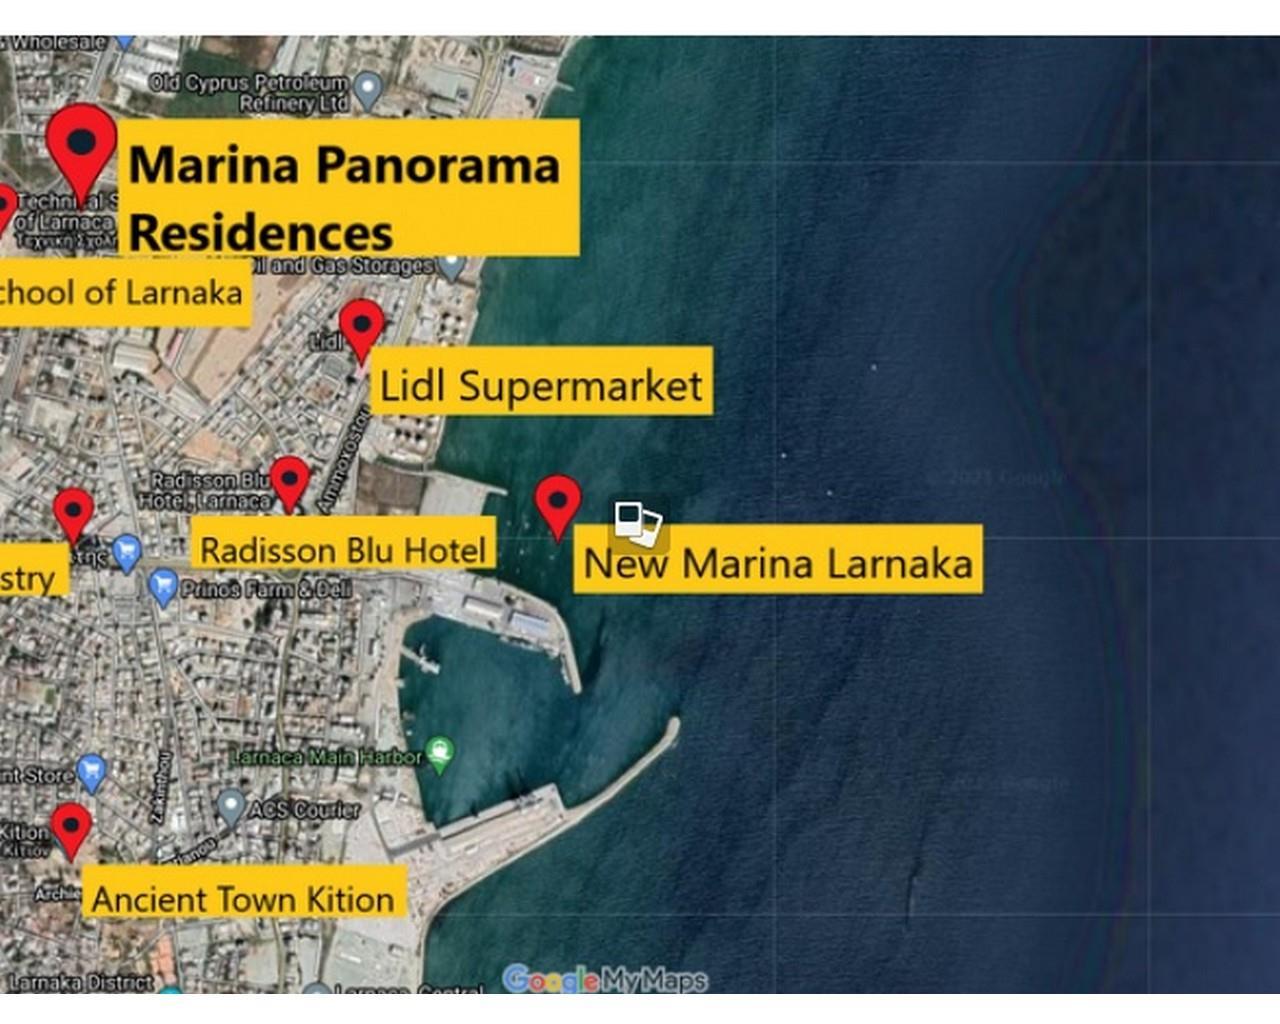 Apartment Larnaca(Larnaca)  3 Bedrooms 2 Bathrooms 99 SqMt f.....